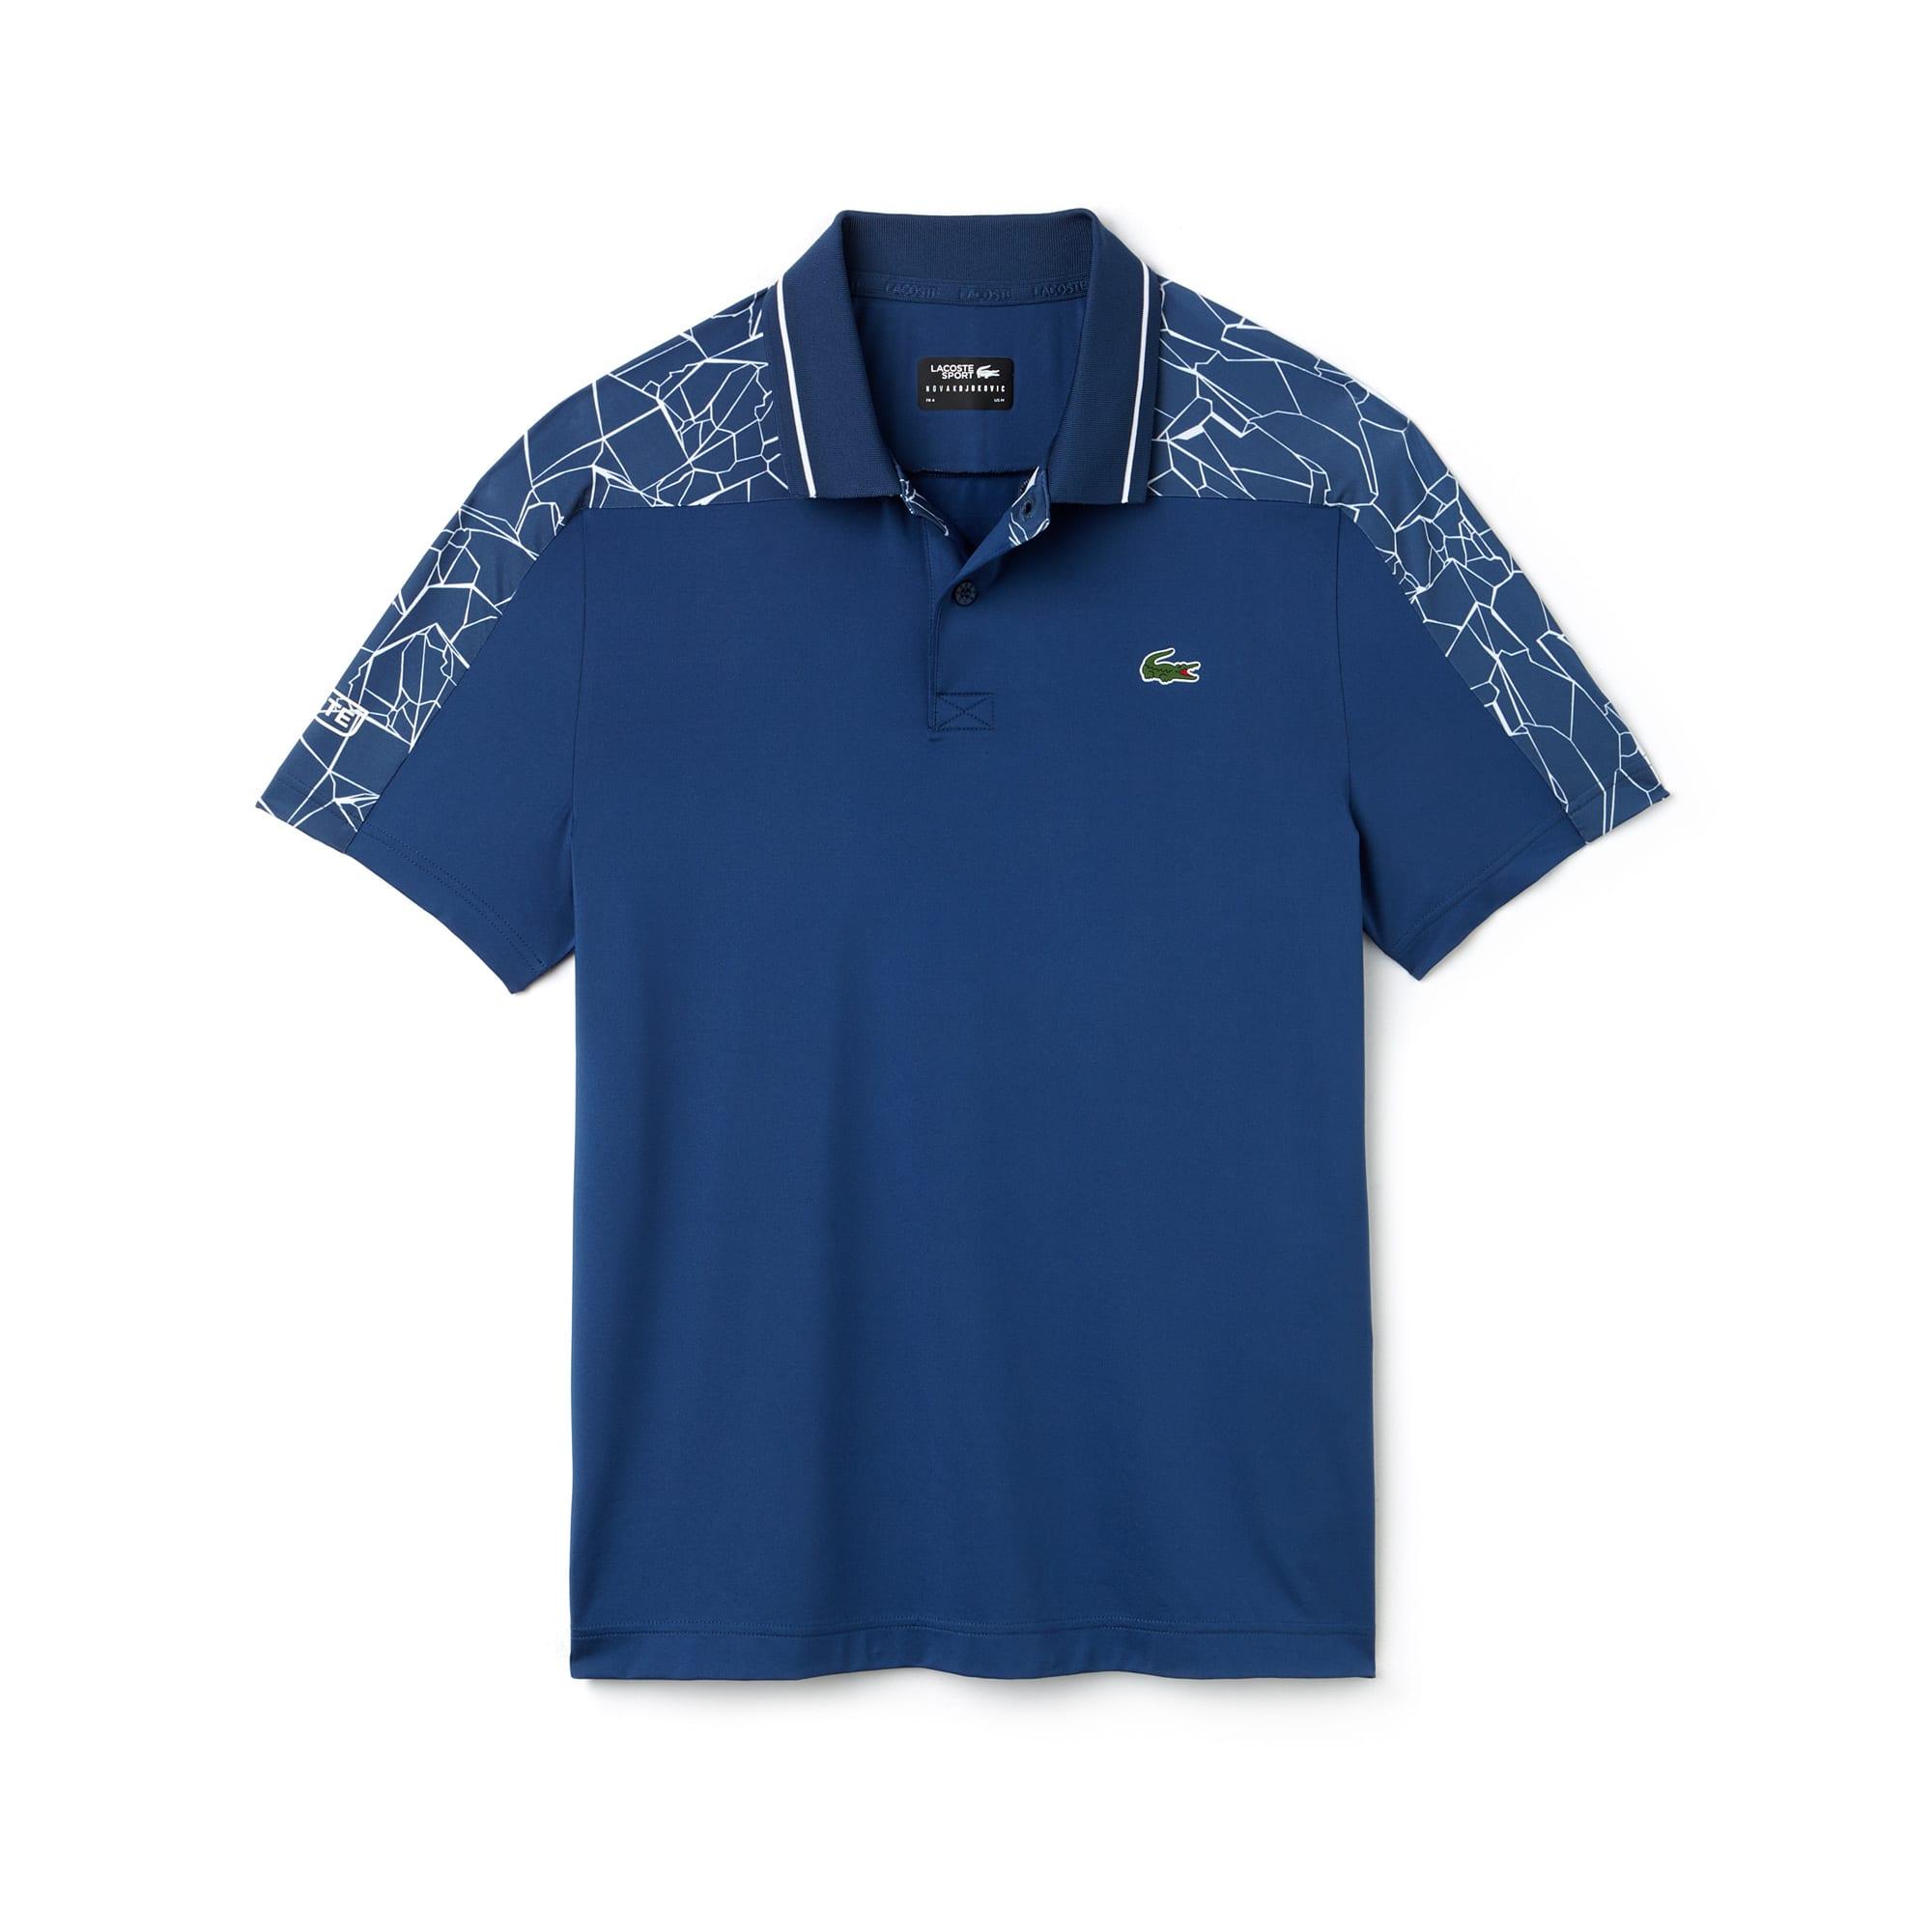 Lacoste - Herren-Poloshirt aus Stretch-Jersey LACOSTE SPORT NOVAK DJOKOVIC - 3